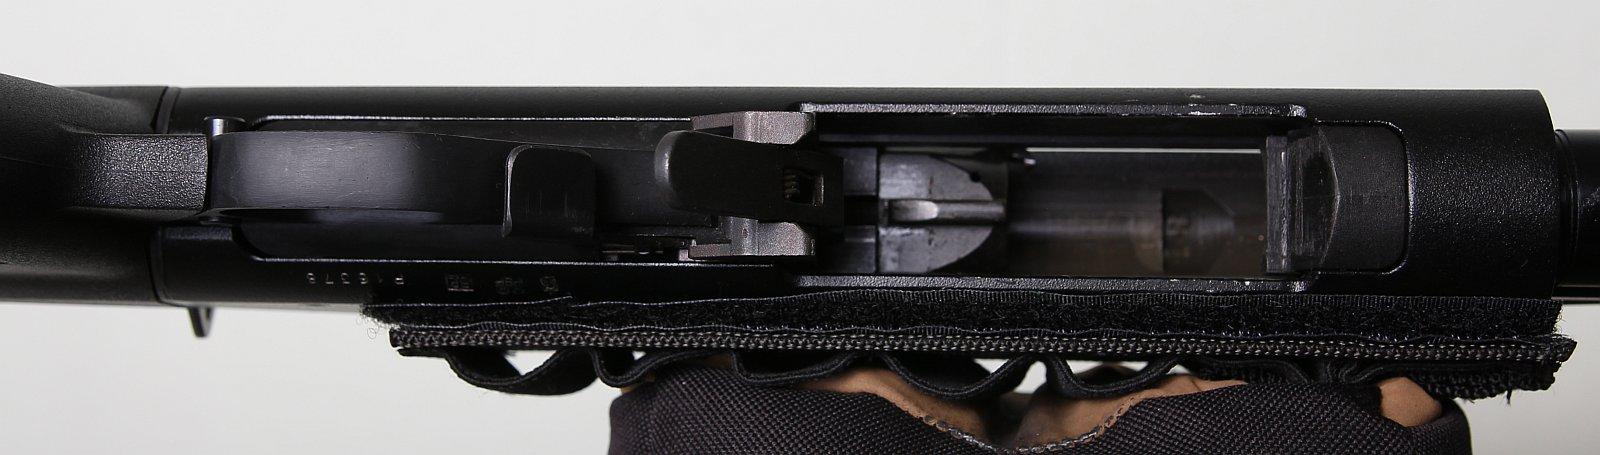 10 Brocal cargador Valtro PM5